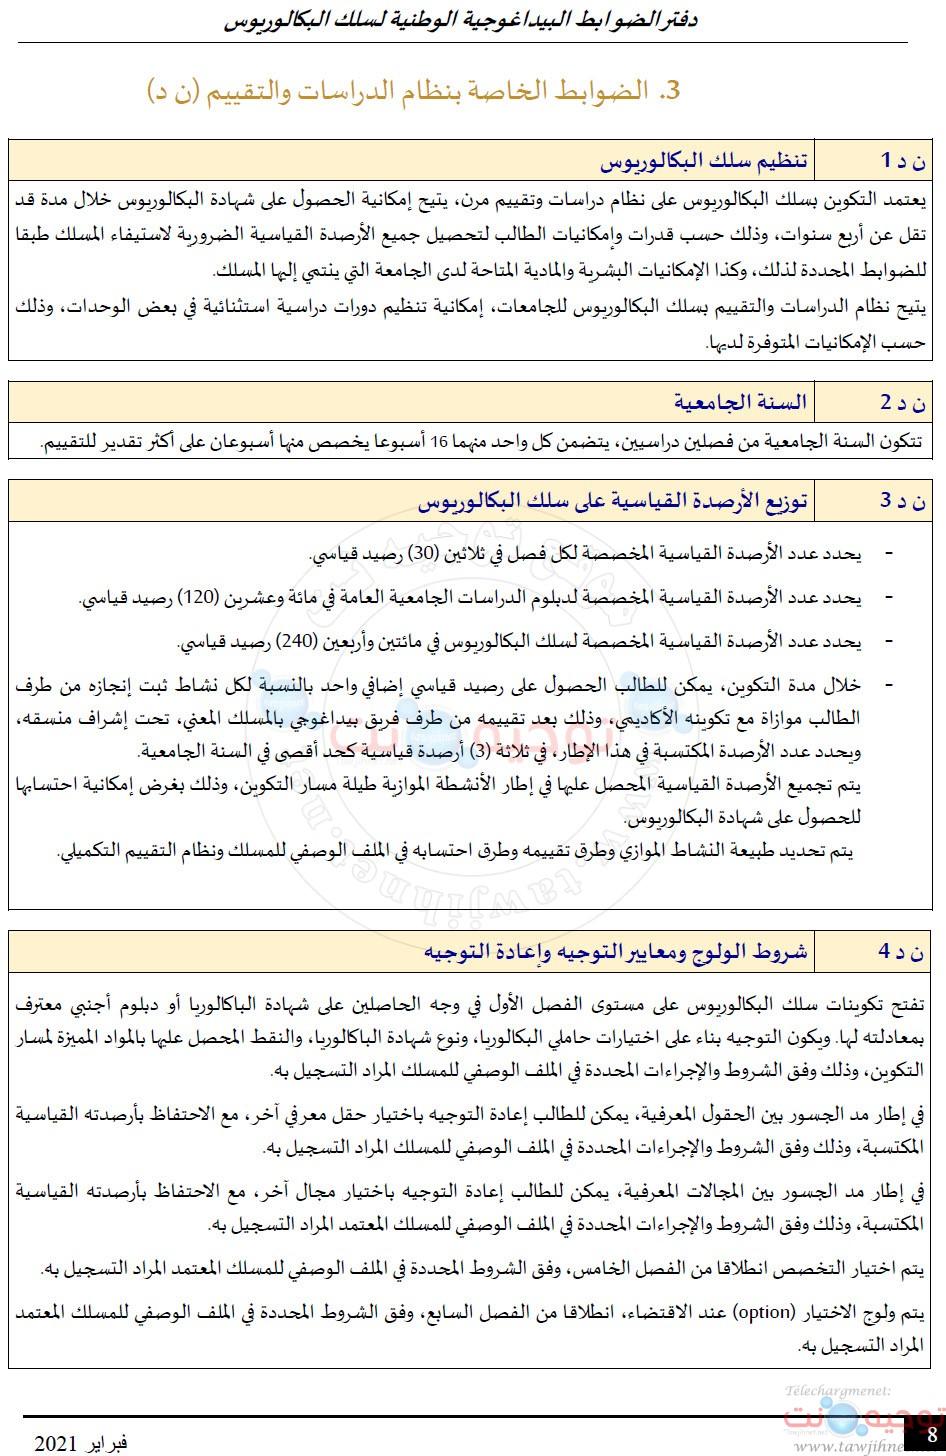 Bachelor-CNPN-normes-pedagoqiques-2021_Page_08.jpg